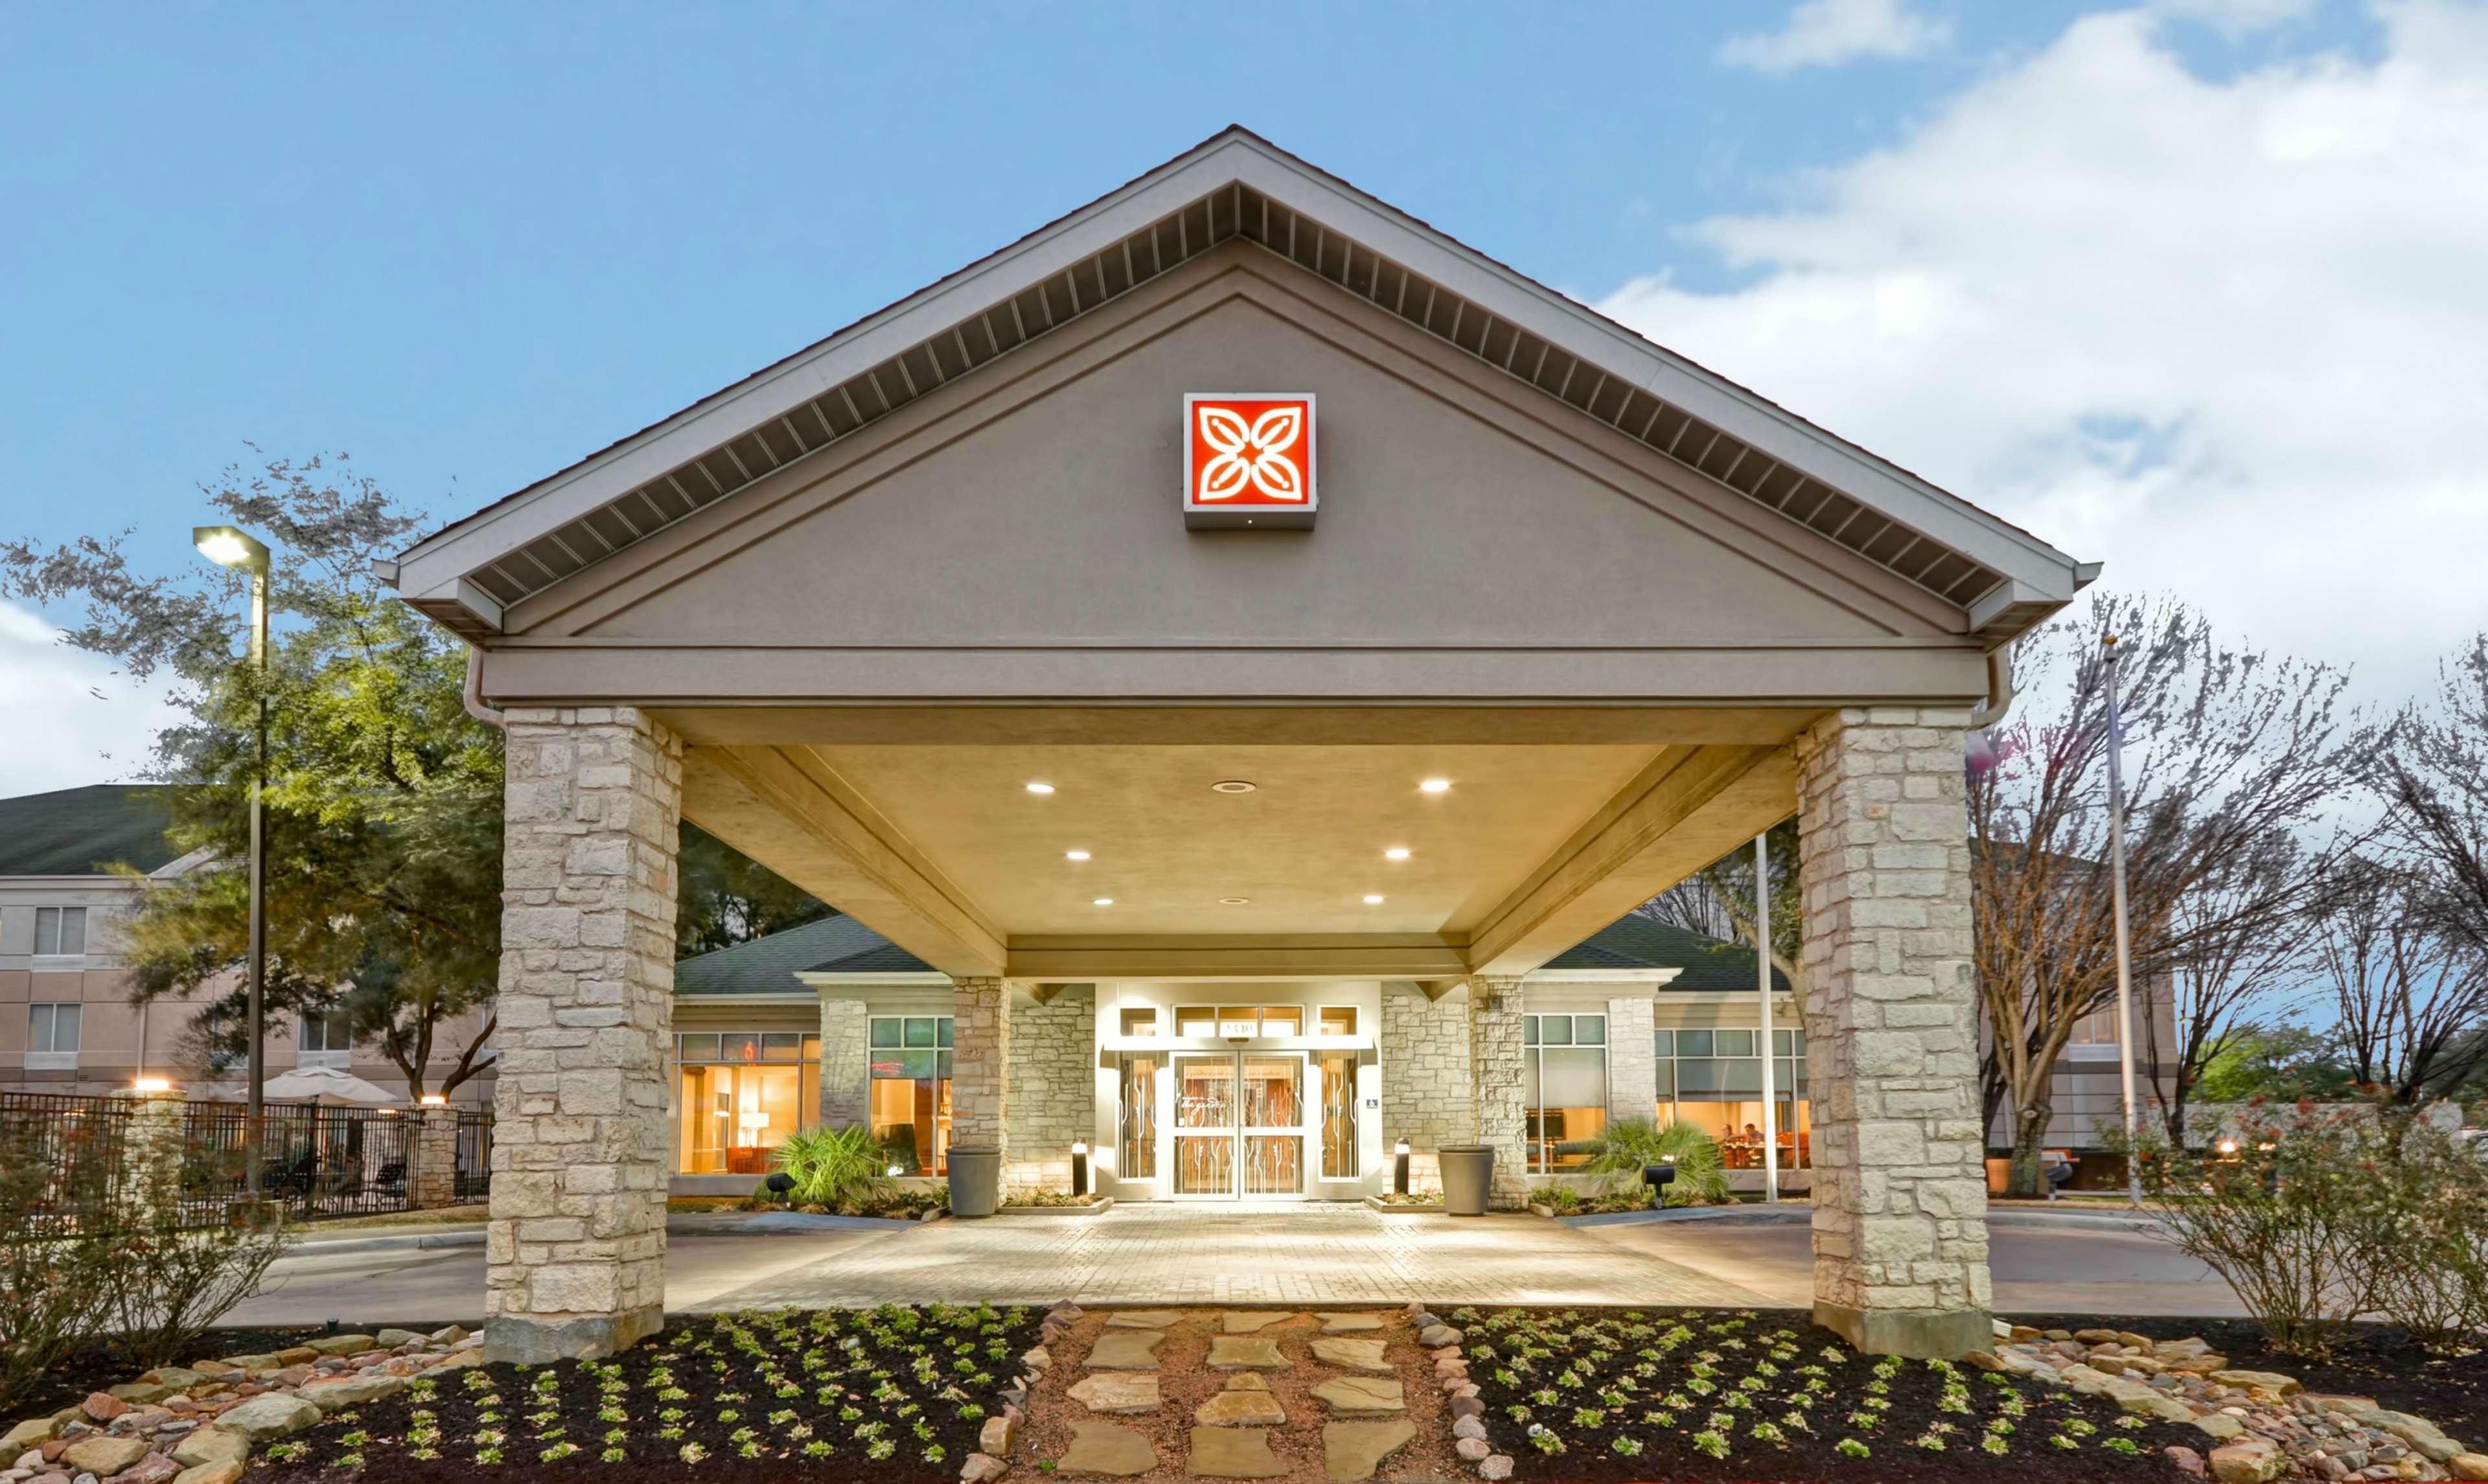 Hilton Garden Inn Austin/Round Rock image 0